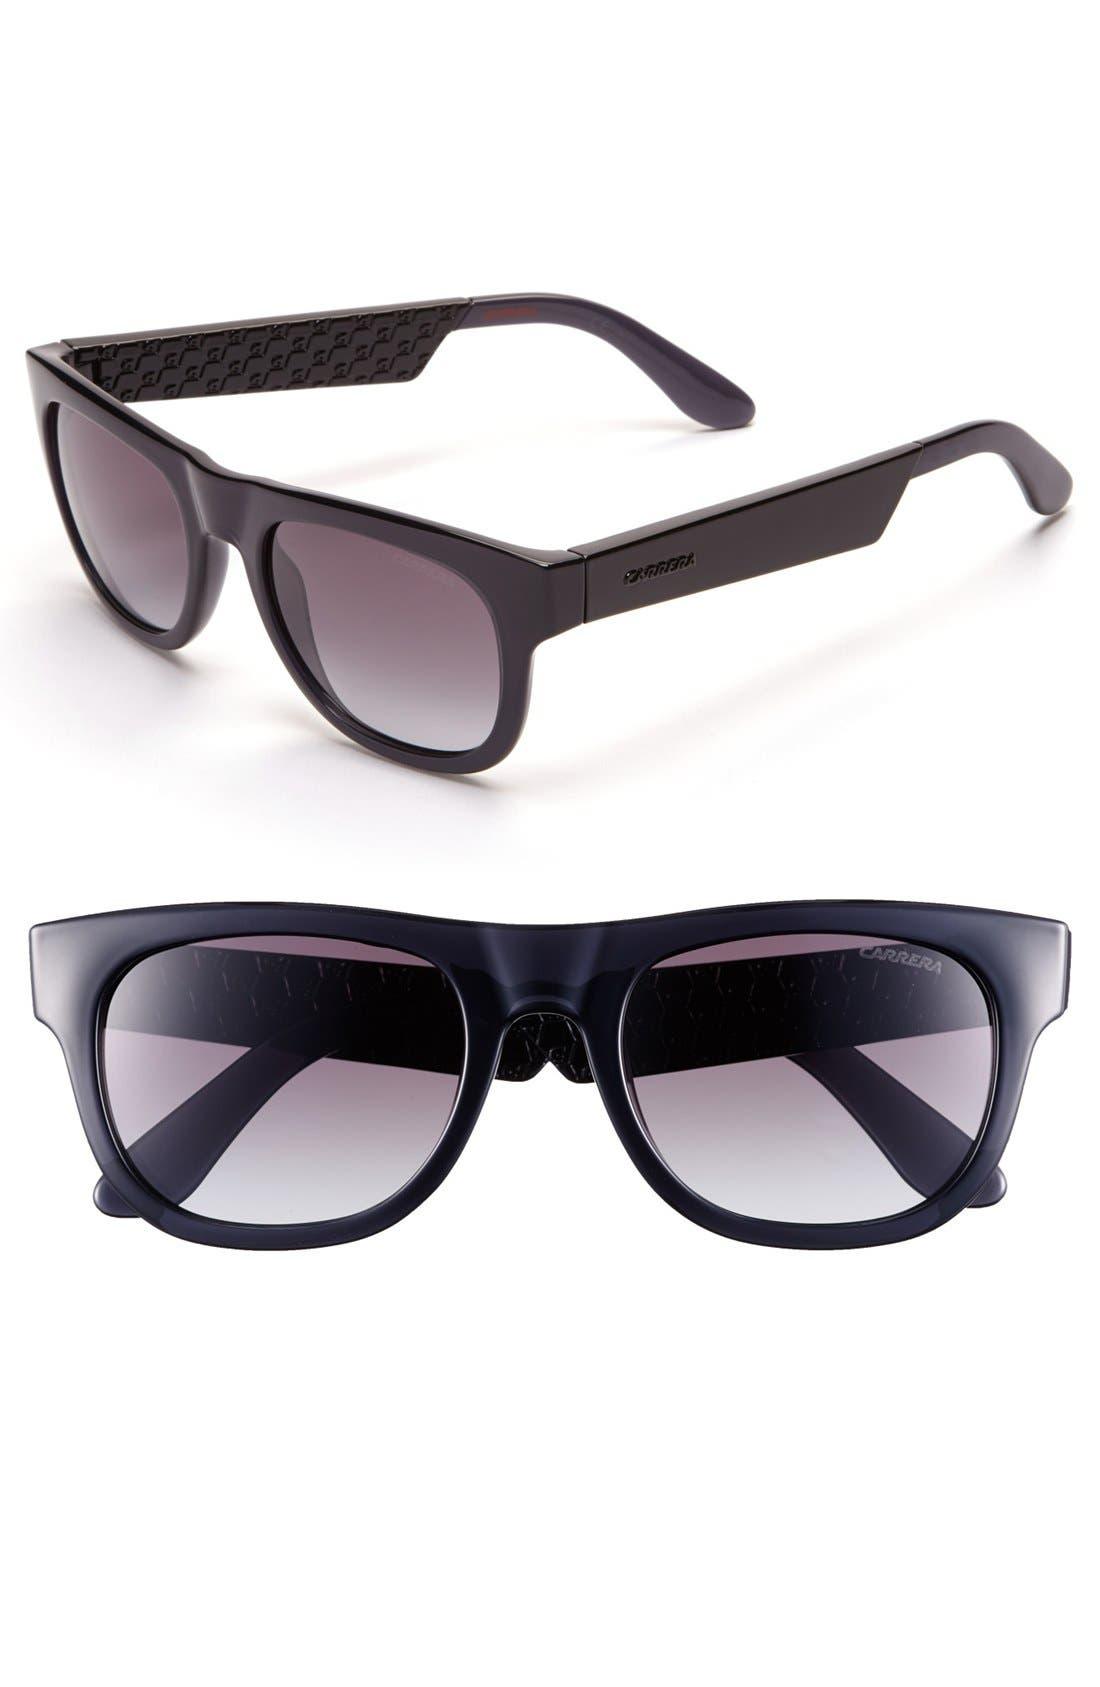 Alternate Image 1 Selected - Carrera Eyewear 52mm Retro Sunglasses